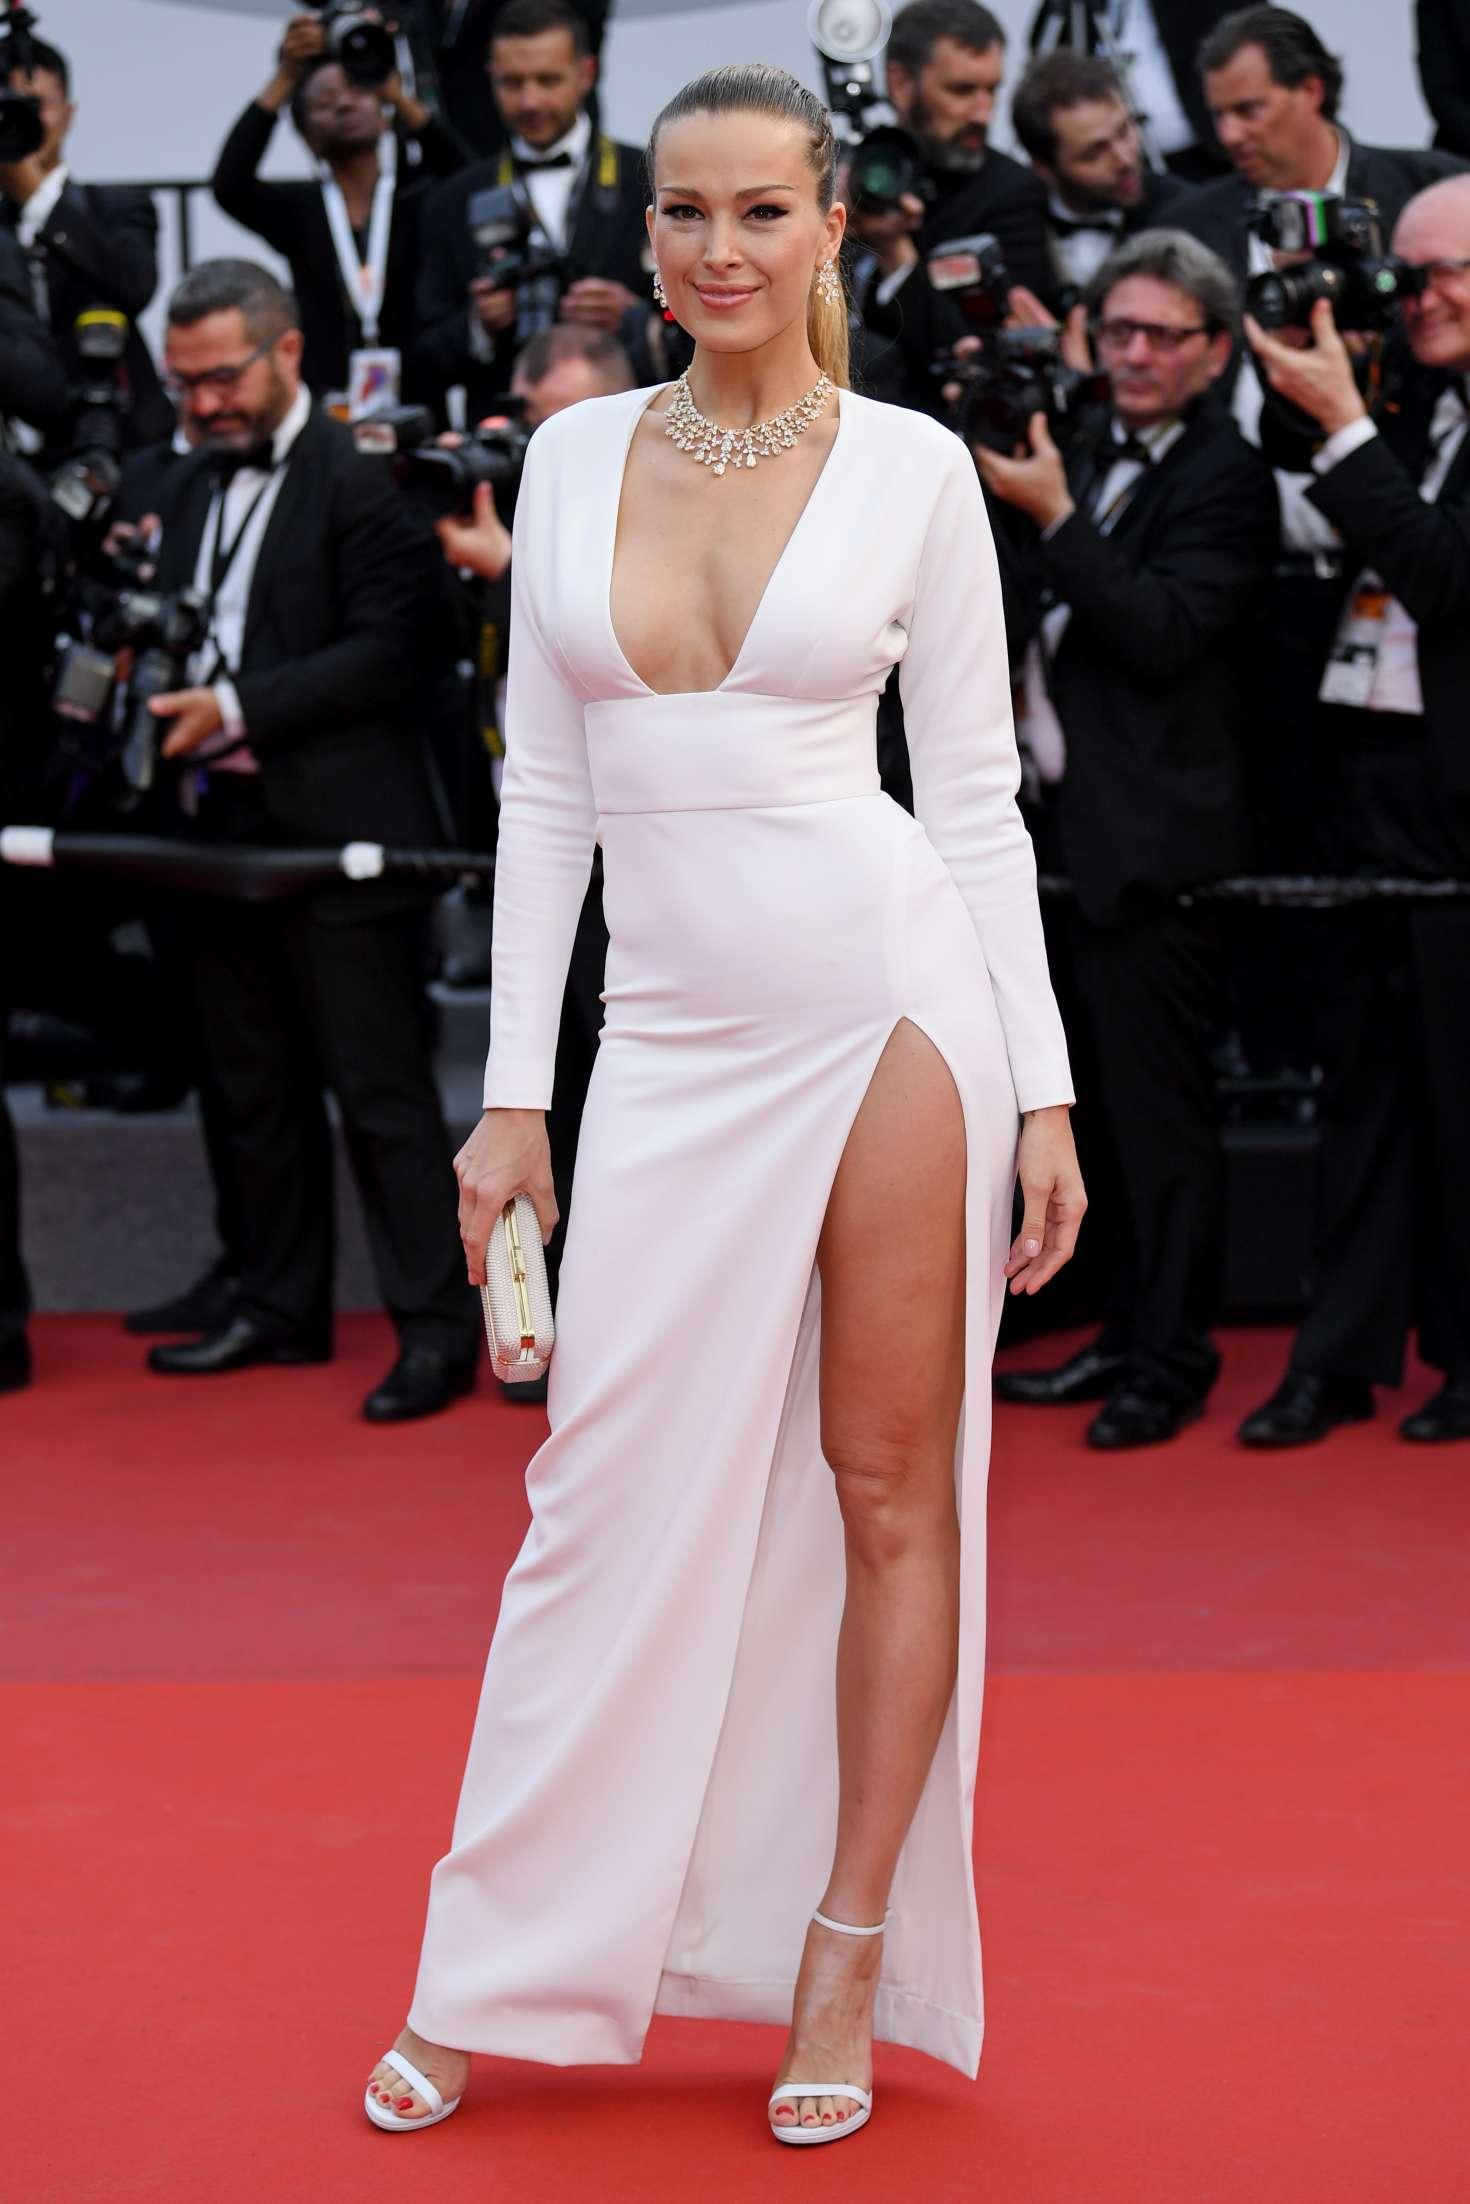 Cannes 2017 - Day 2 - Loveless première - Top Model & Chopard Ambassador Petra Nemcova